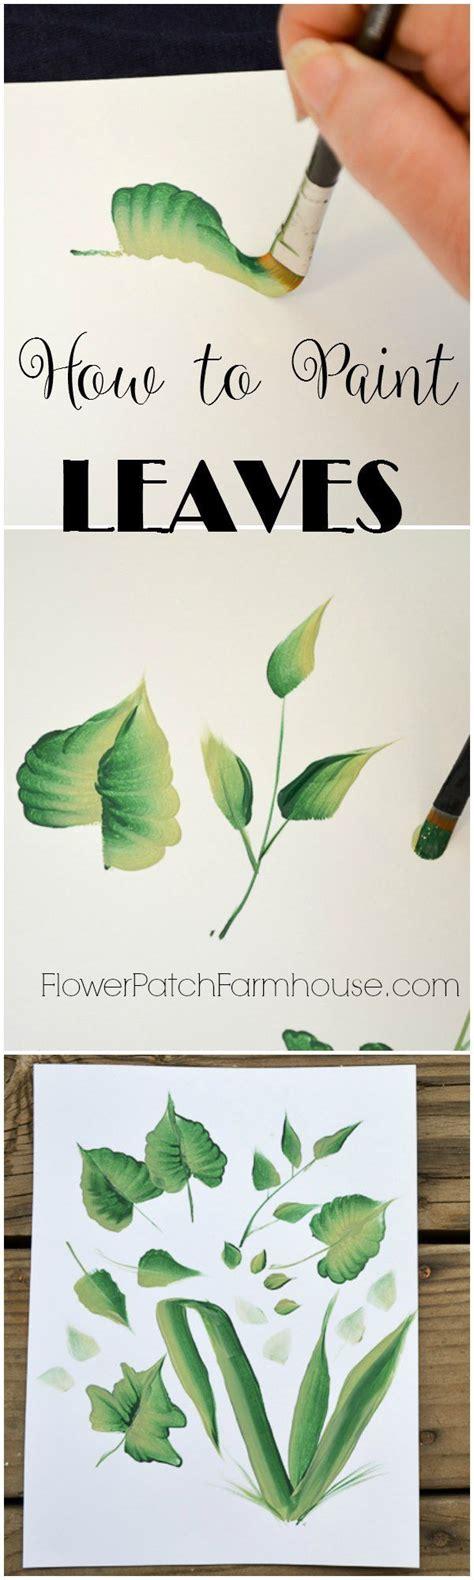 learn decorative painting best 20 painting tutorials ideas on pinterest